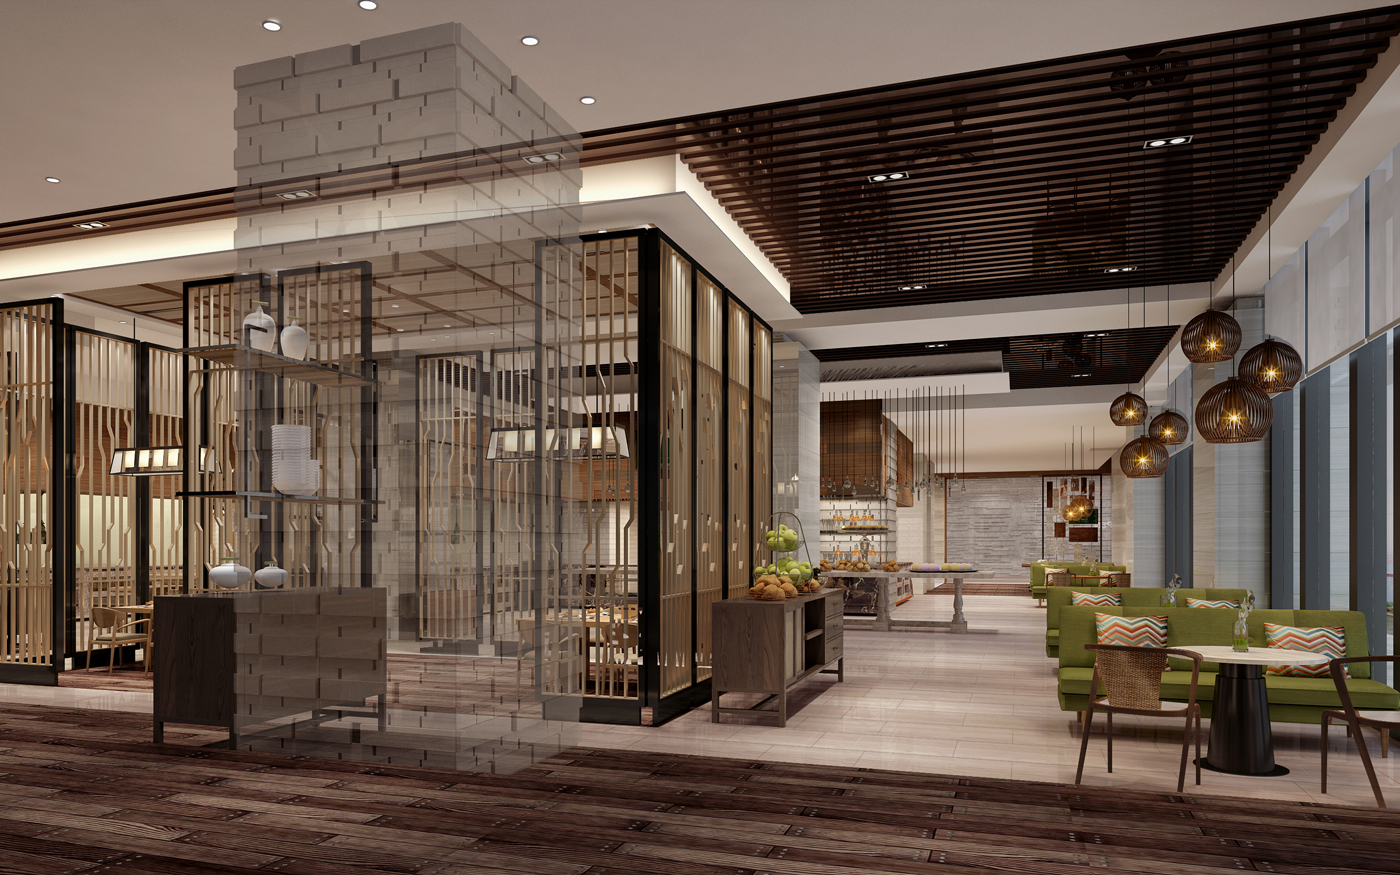 Doubletree-By-Hilton-Resort-_web_8